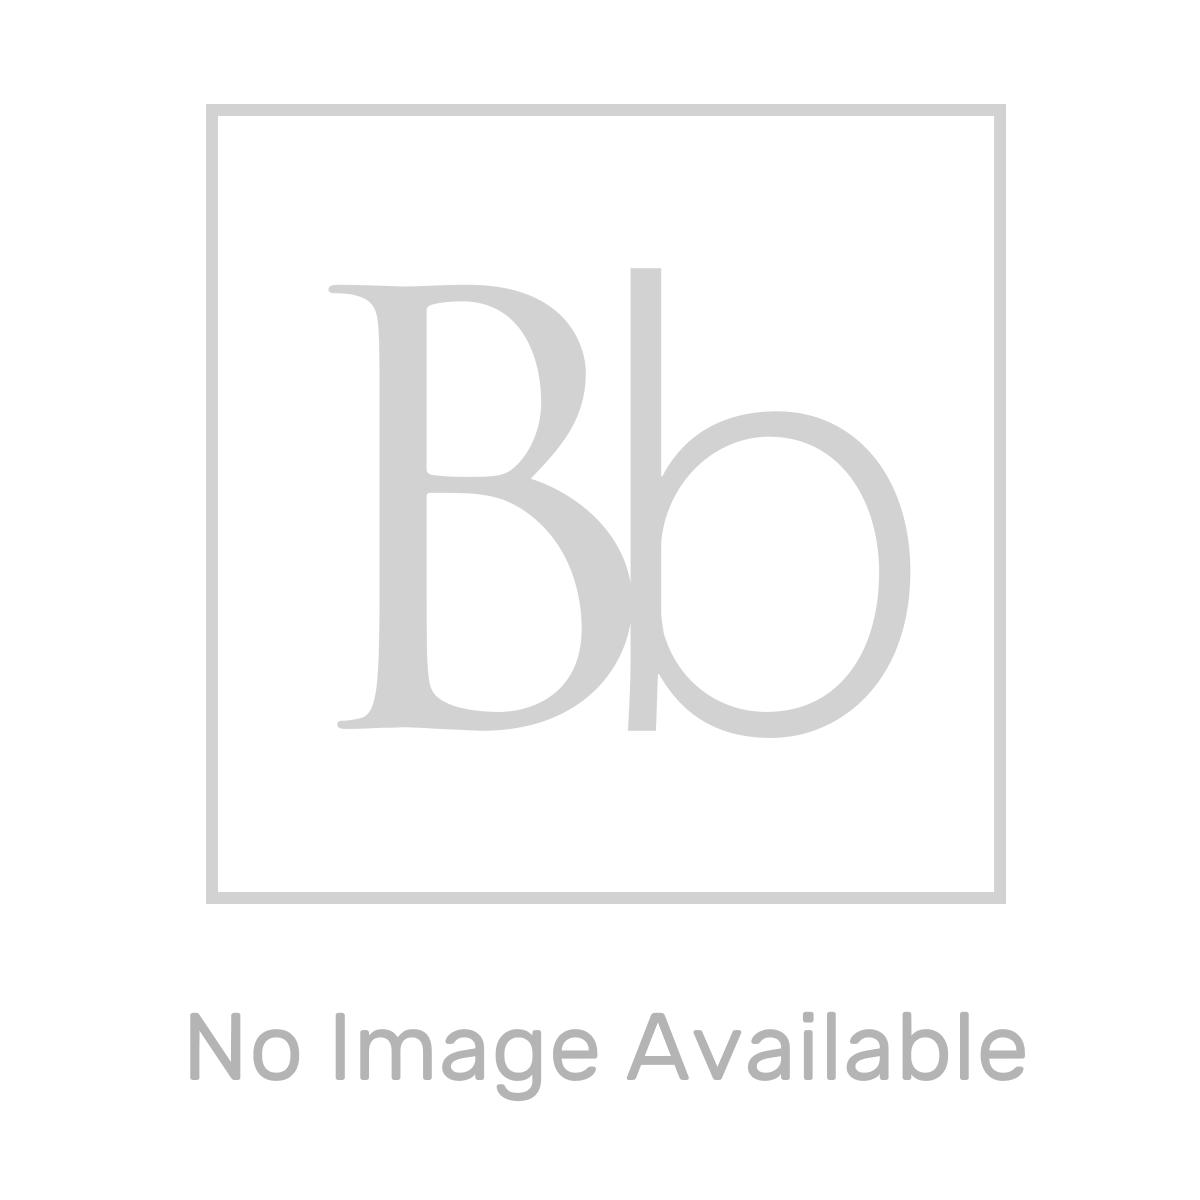 RAK Series 600 Toilet and 400 Series Walnut Vanity Unit Front